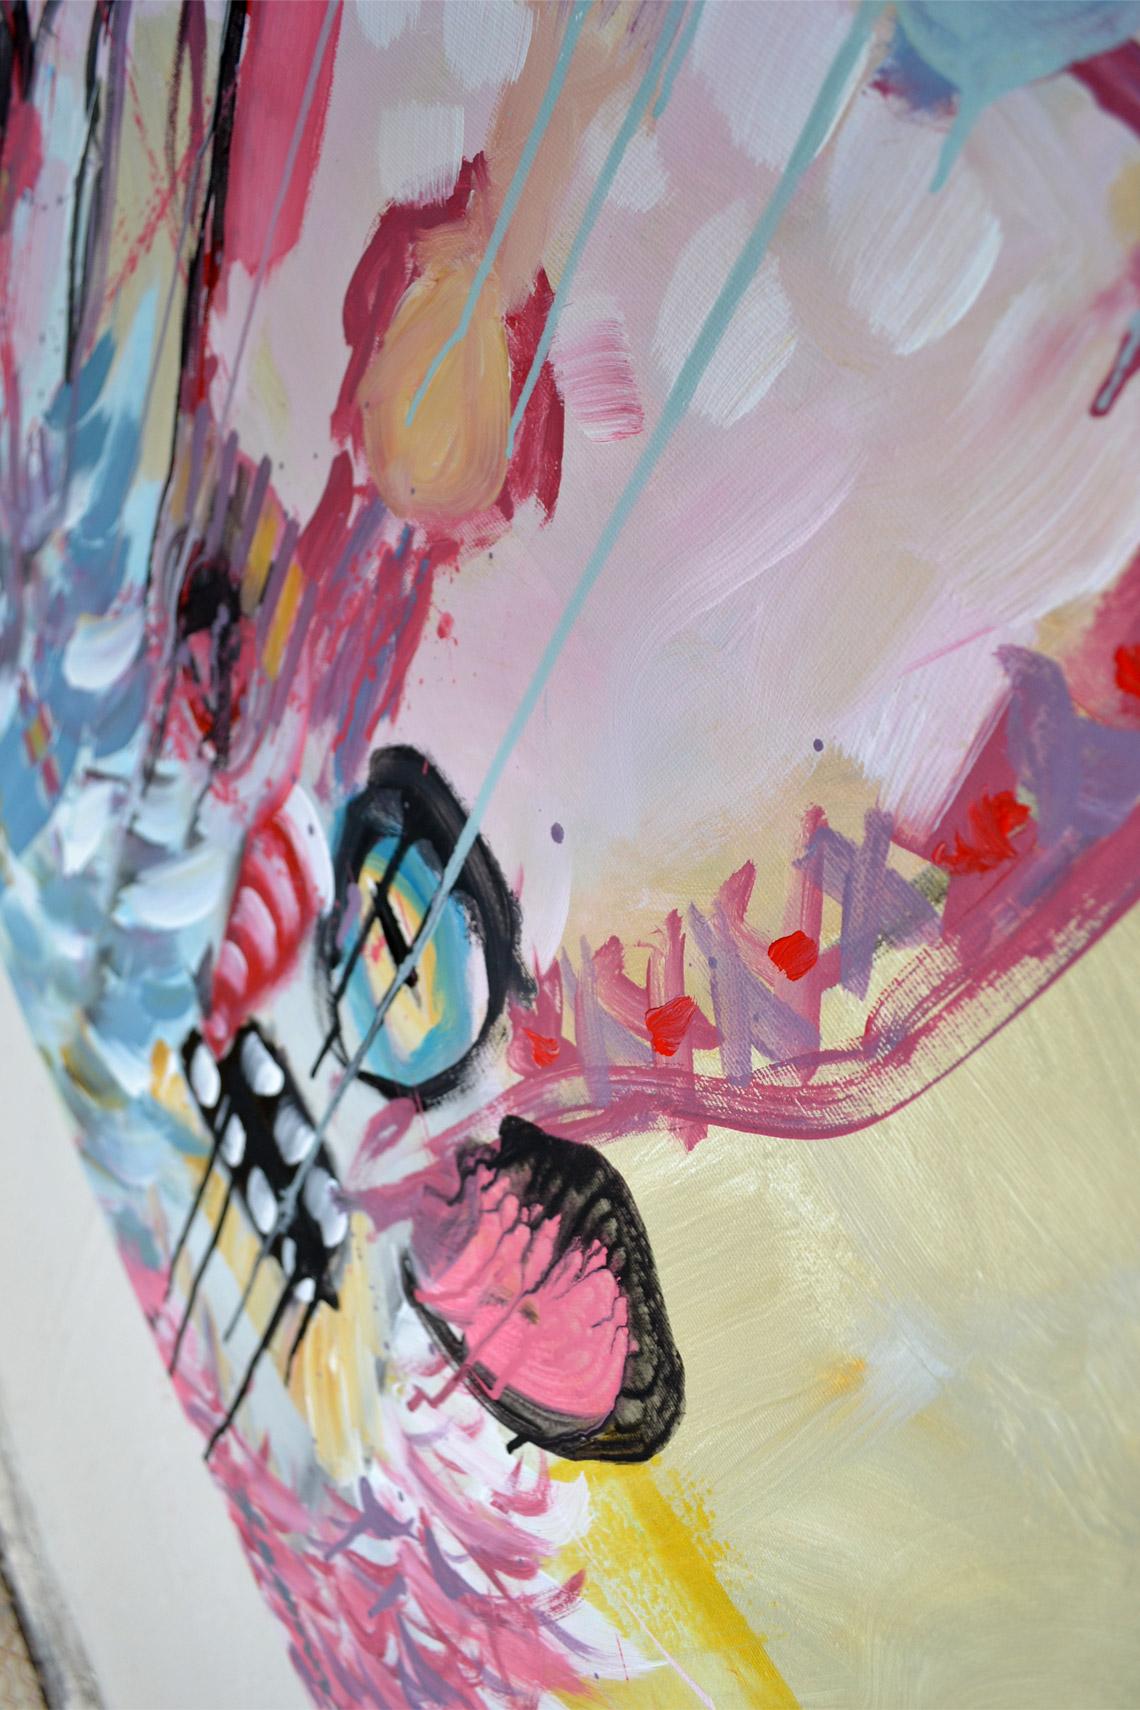 Zemansky Martin painting Carnival no. 01 detail 05